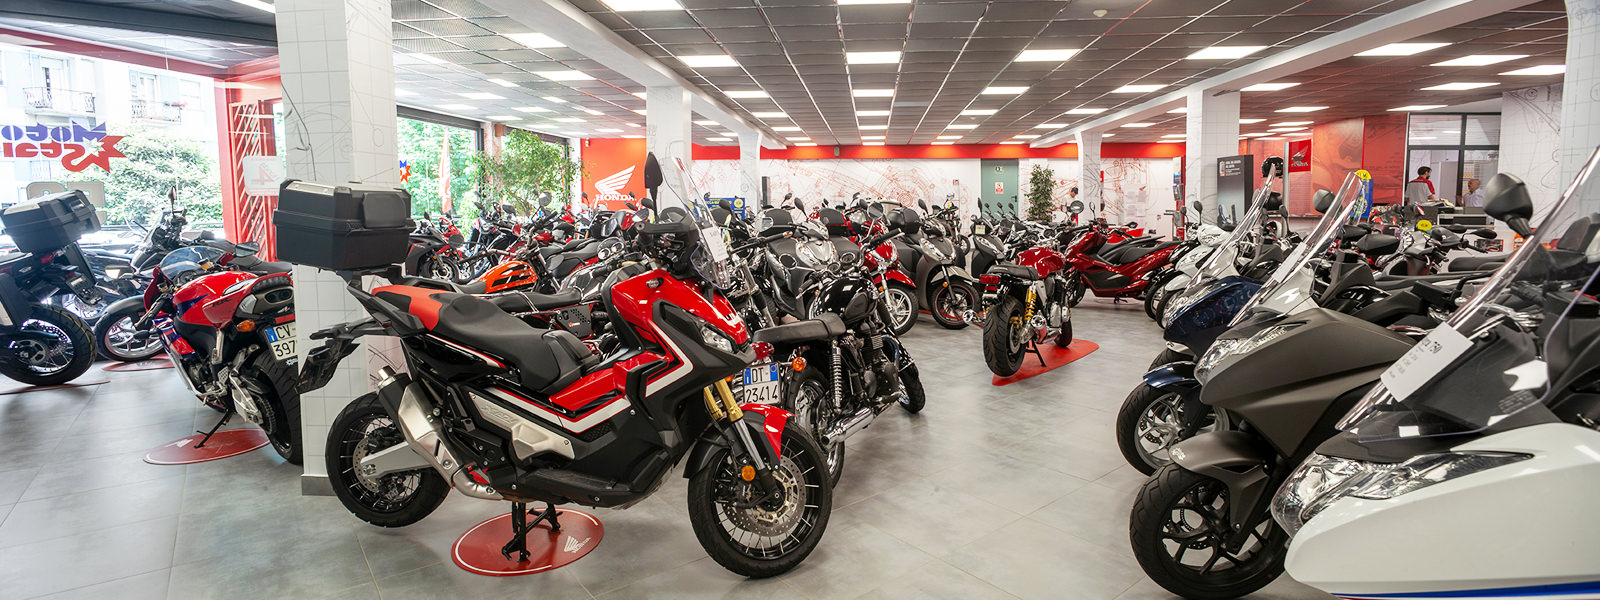 Sissi Moto Crema Usato vendita moto e scooter concessionaria honda | motostar milano